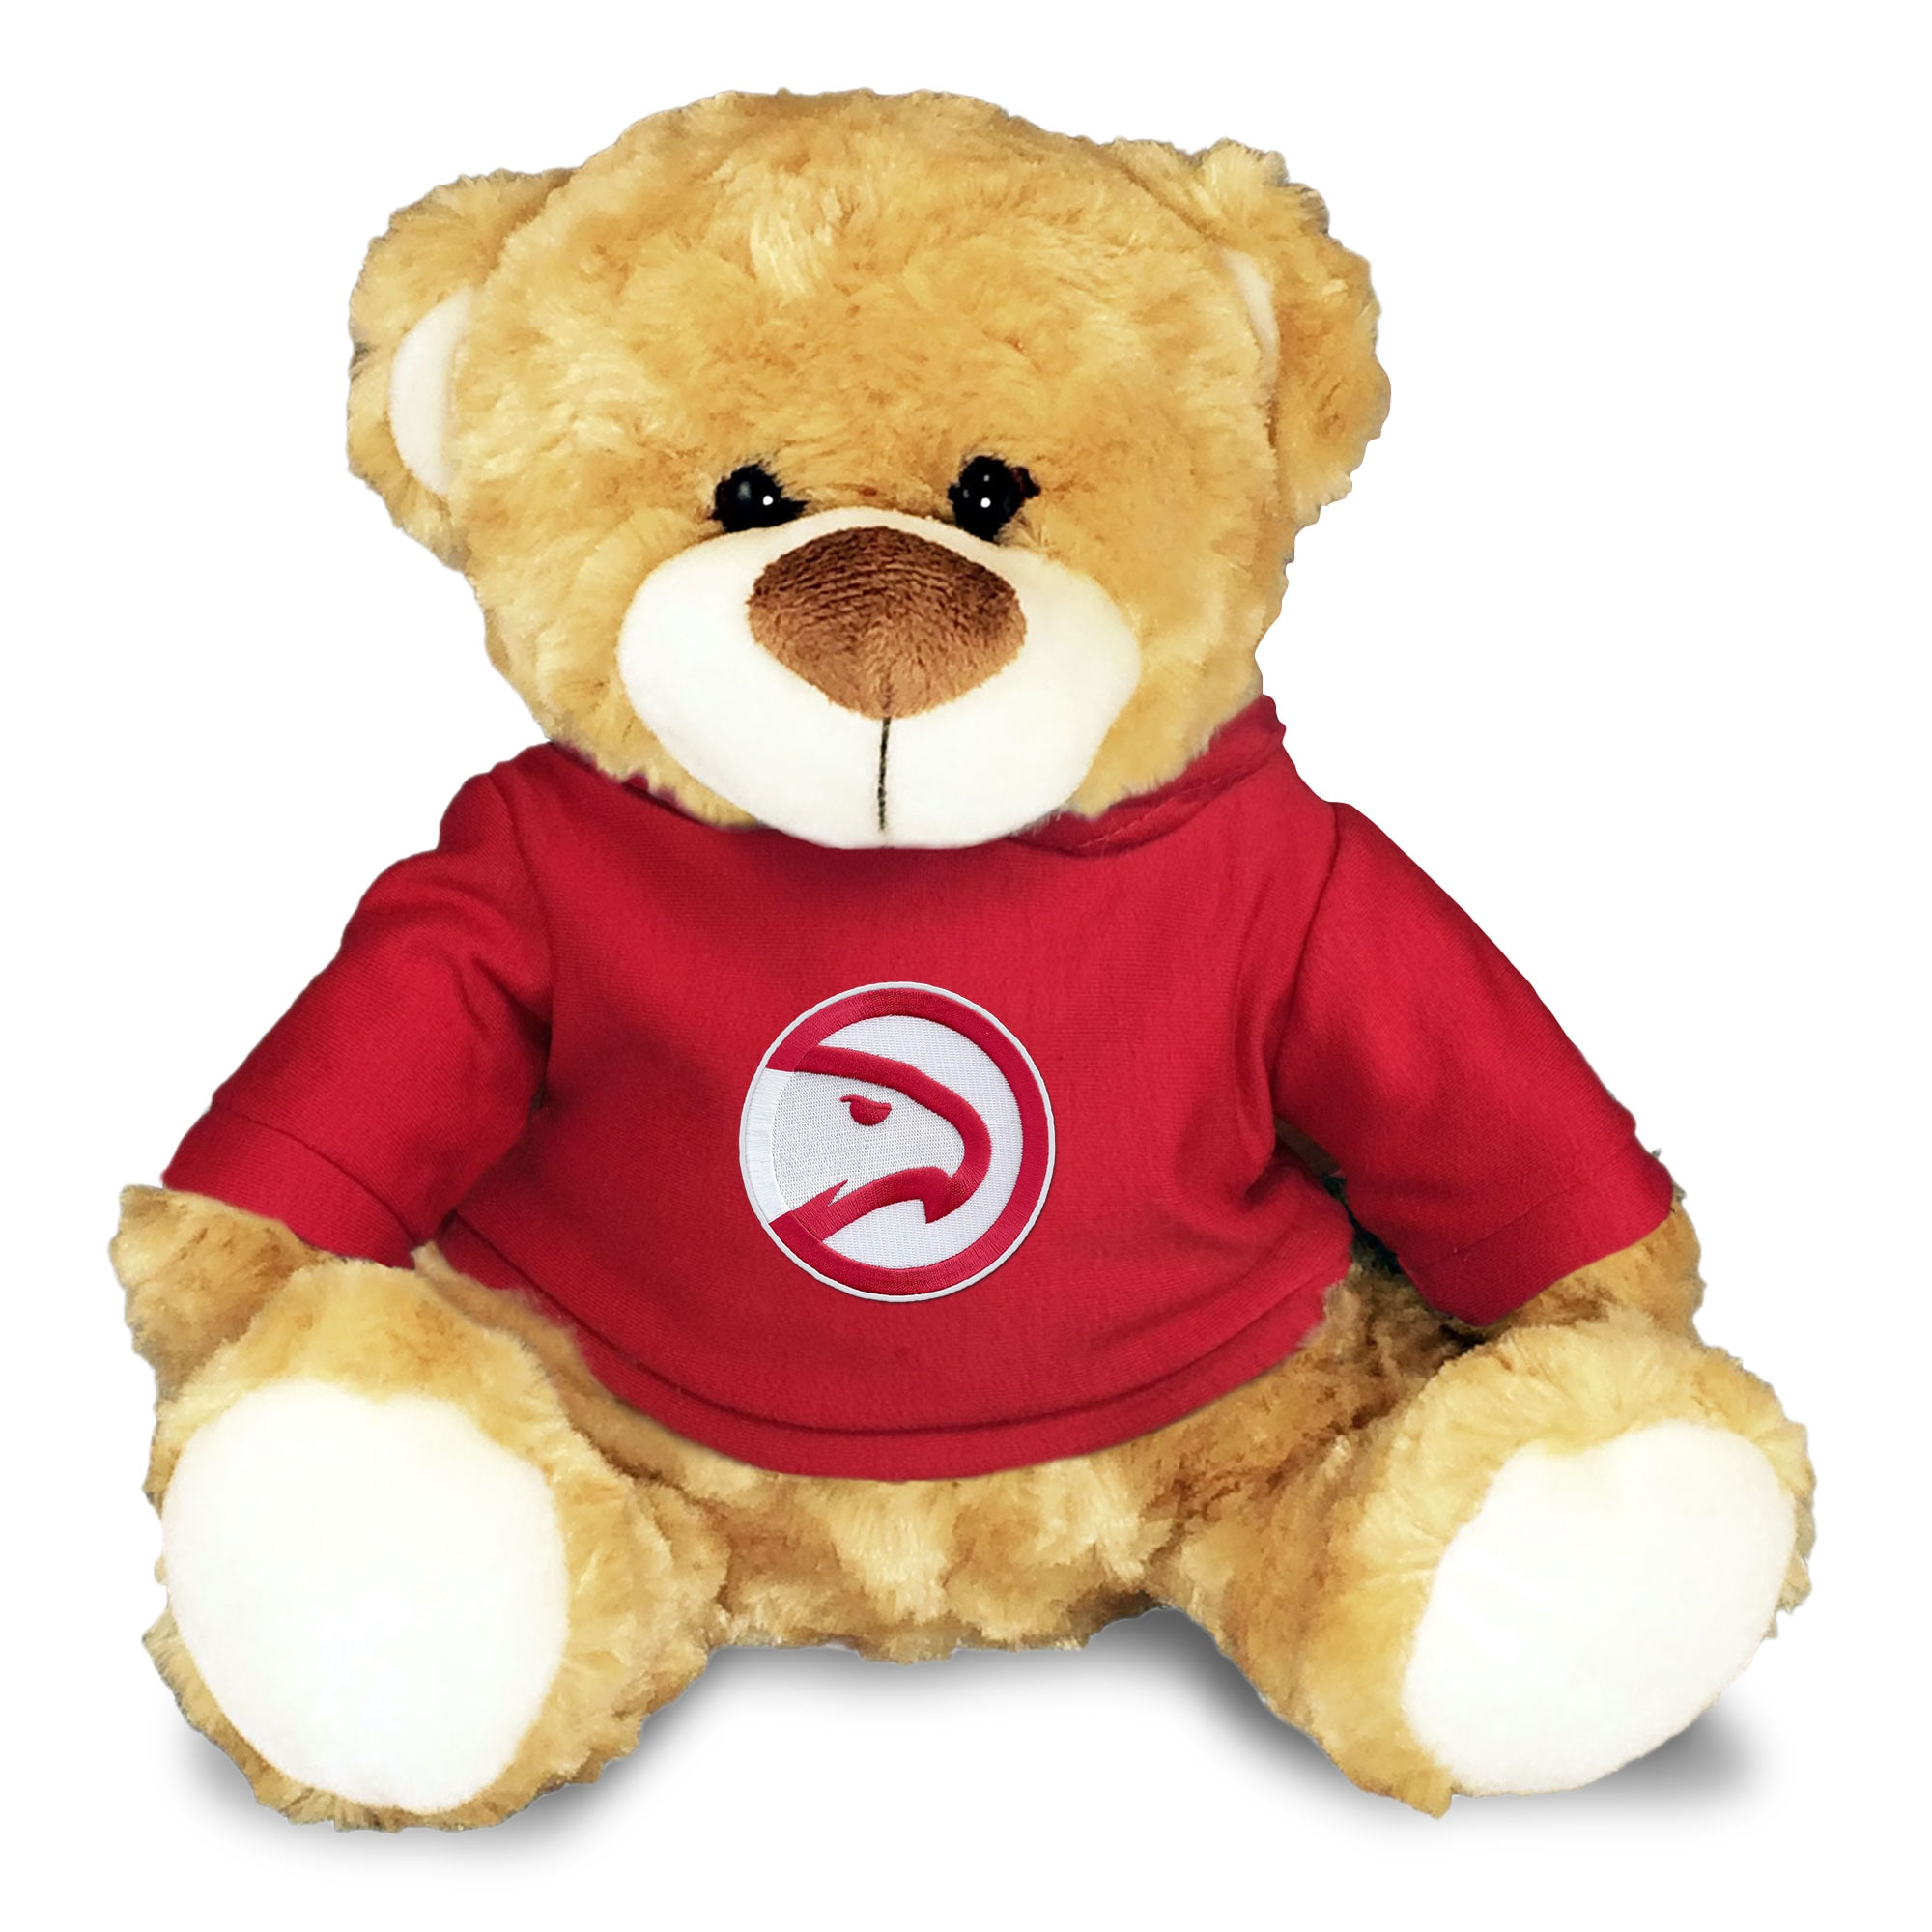 Atlanta Hawks Personalized 10'' Plush Bear - Red